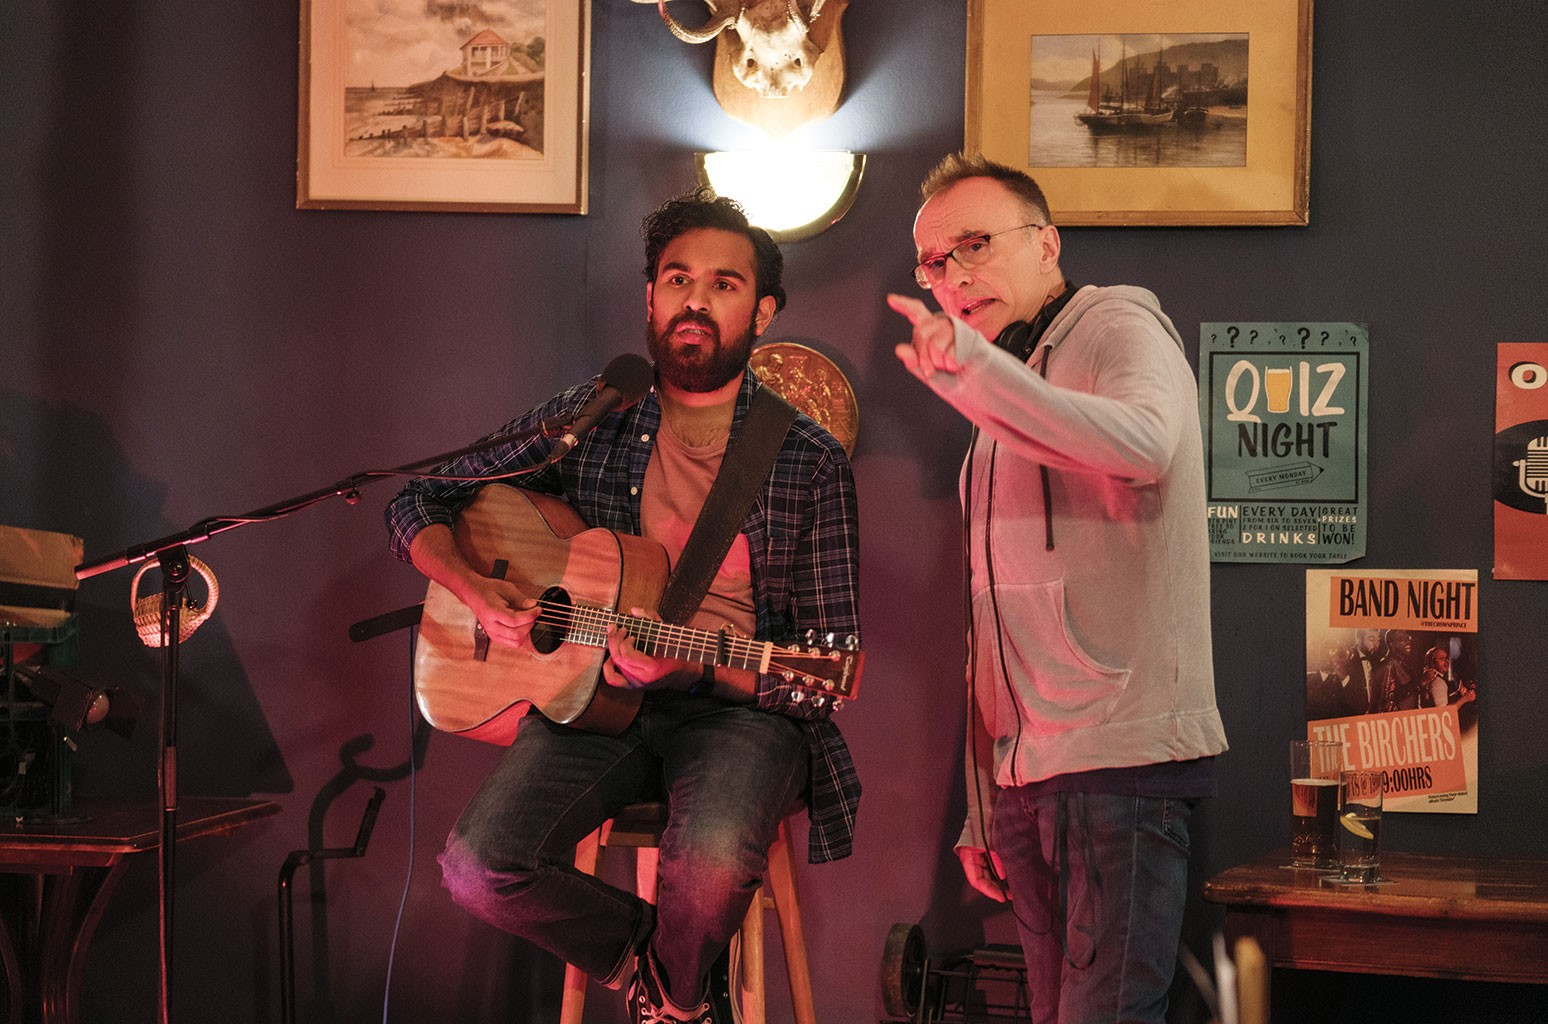 Danny Boyle and Himesh Patel